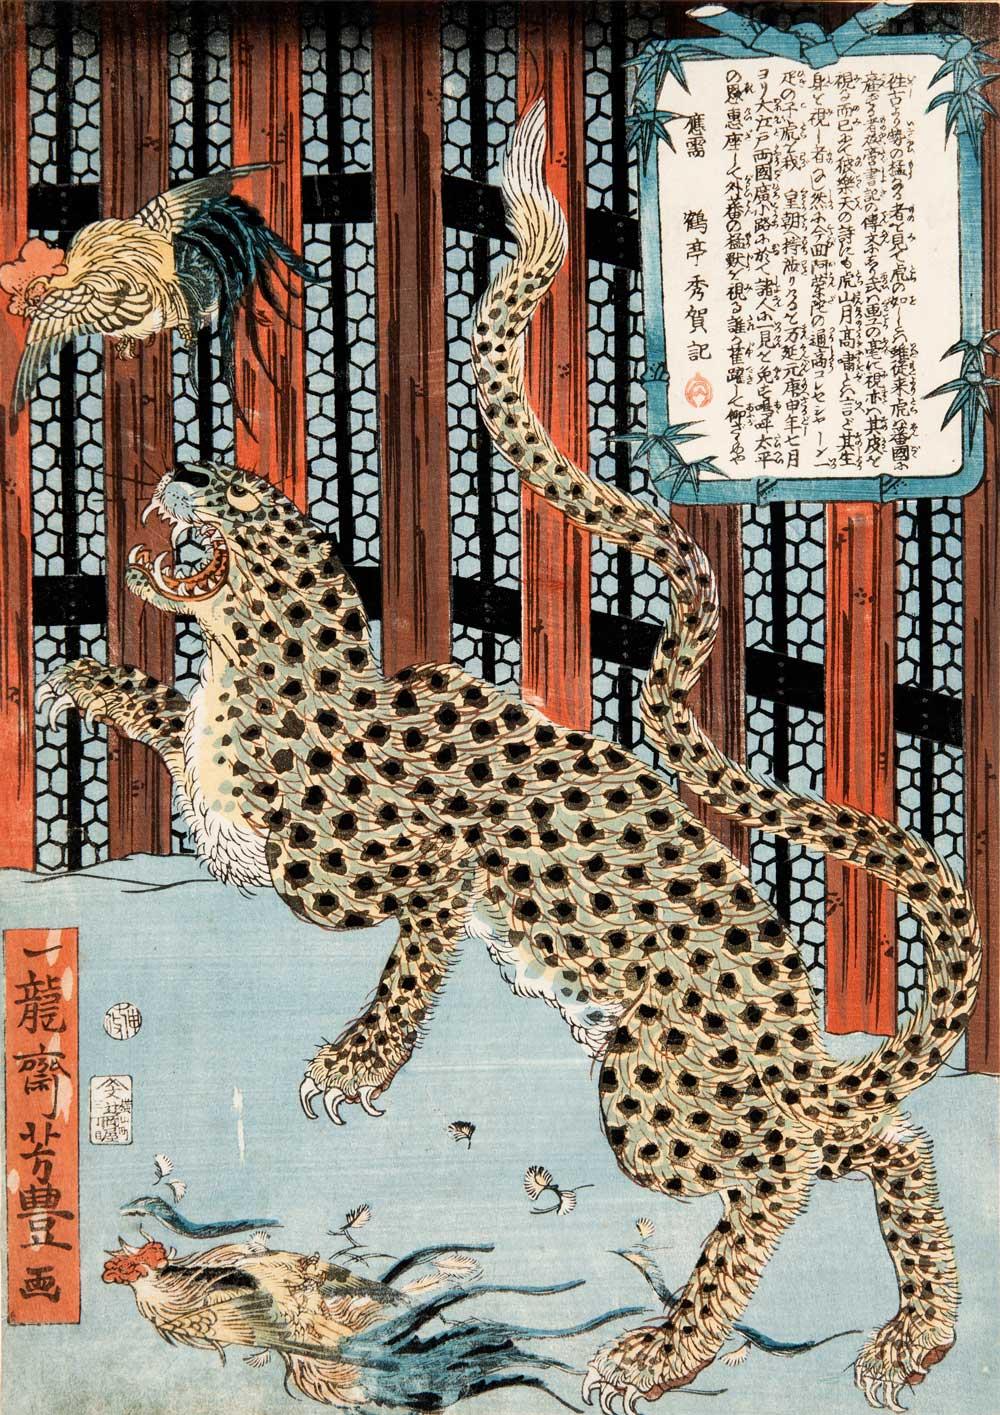 Ichiryusai (Utagawa) Yoshitoyo, Art Gallery of South Australia, Adelaide